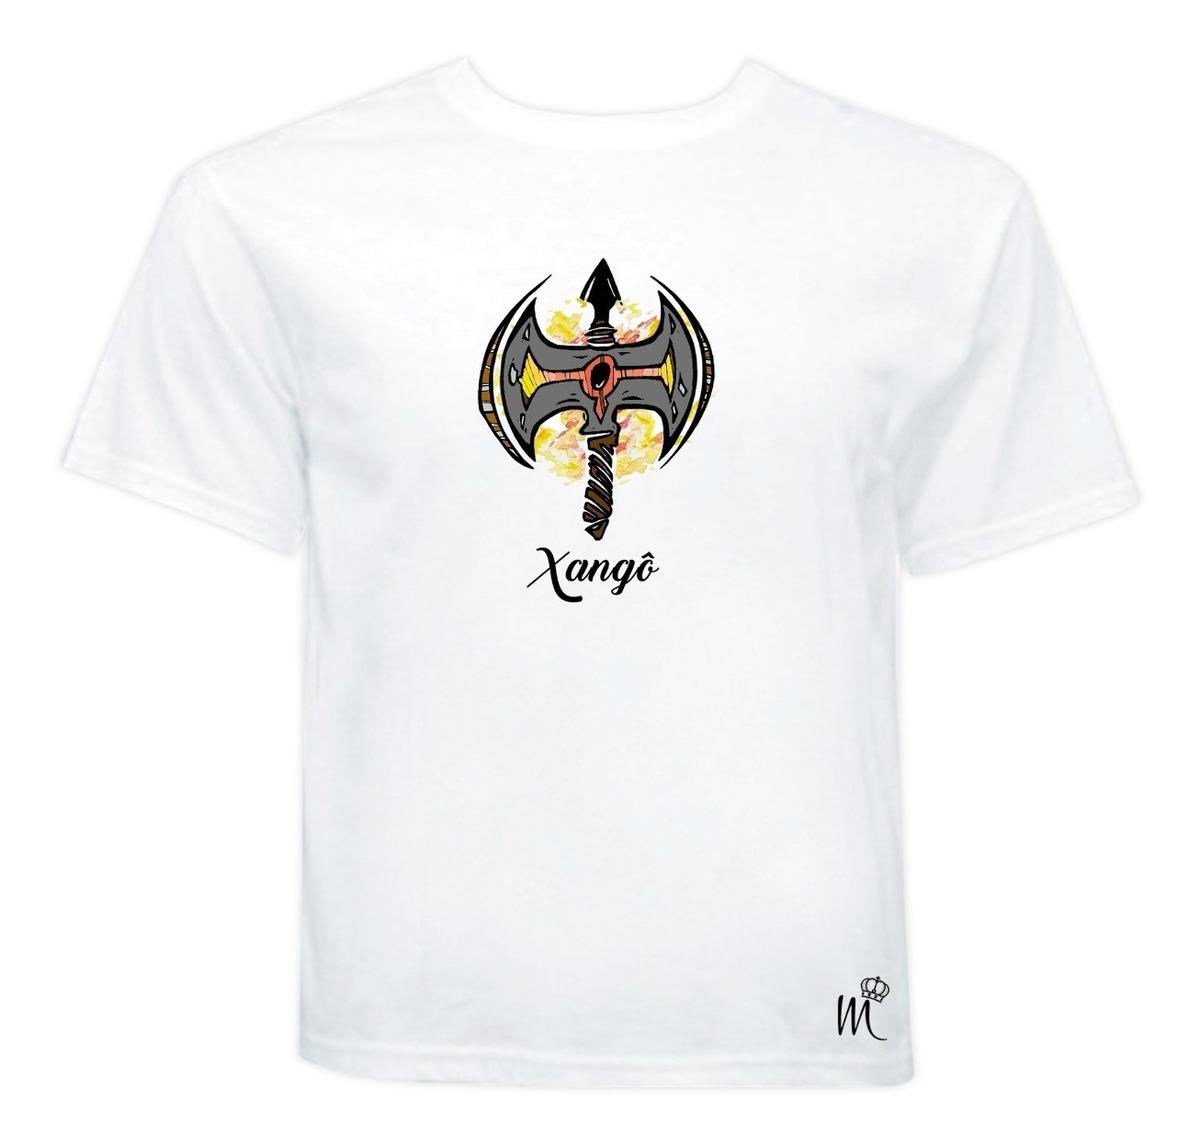 Camiseta Machado De Xango Kao Orixa Umbanda Candomble R 33 90